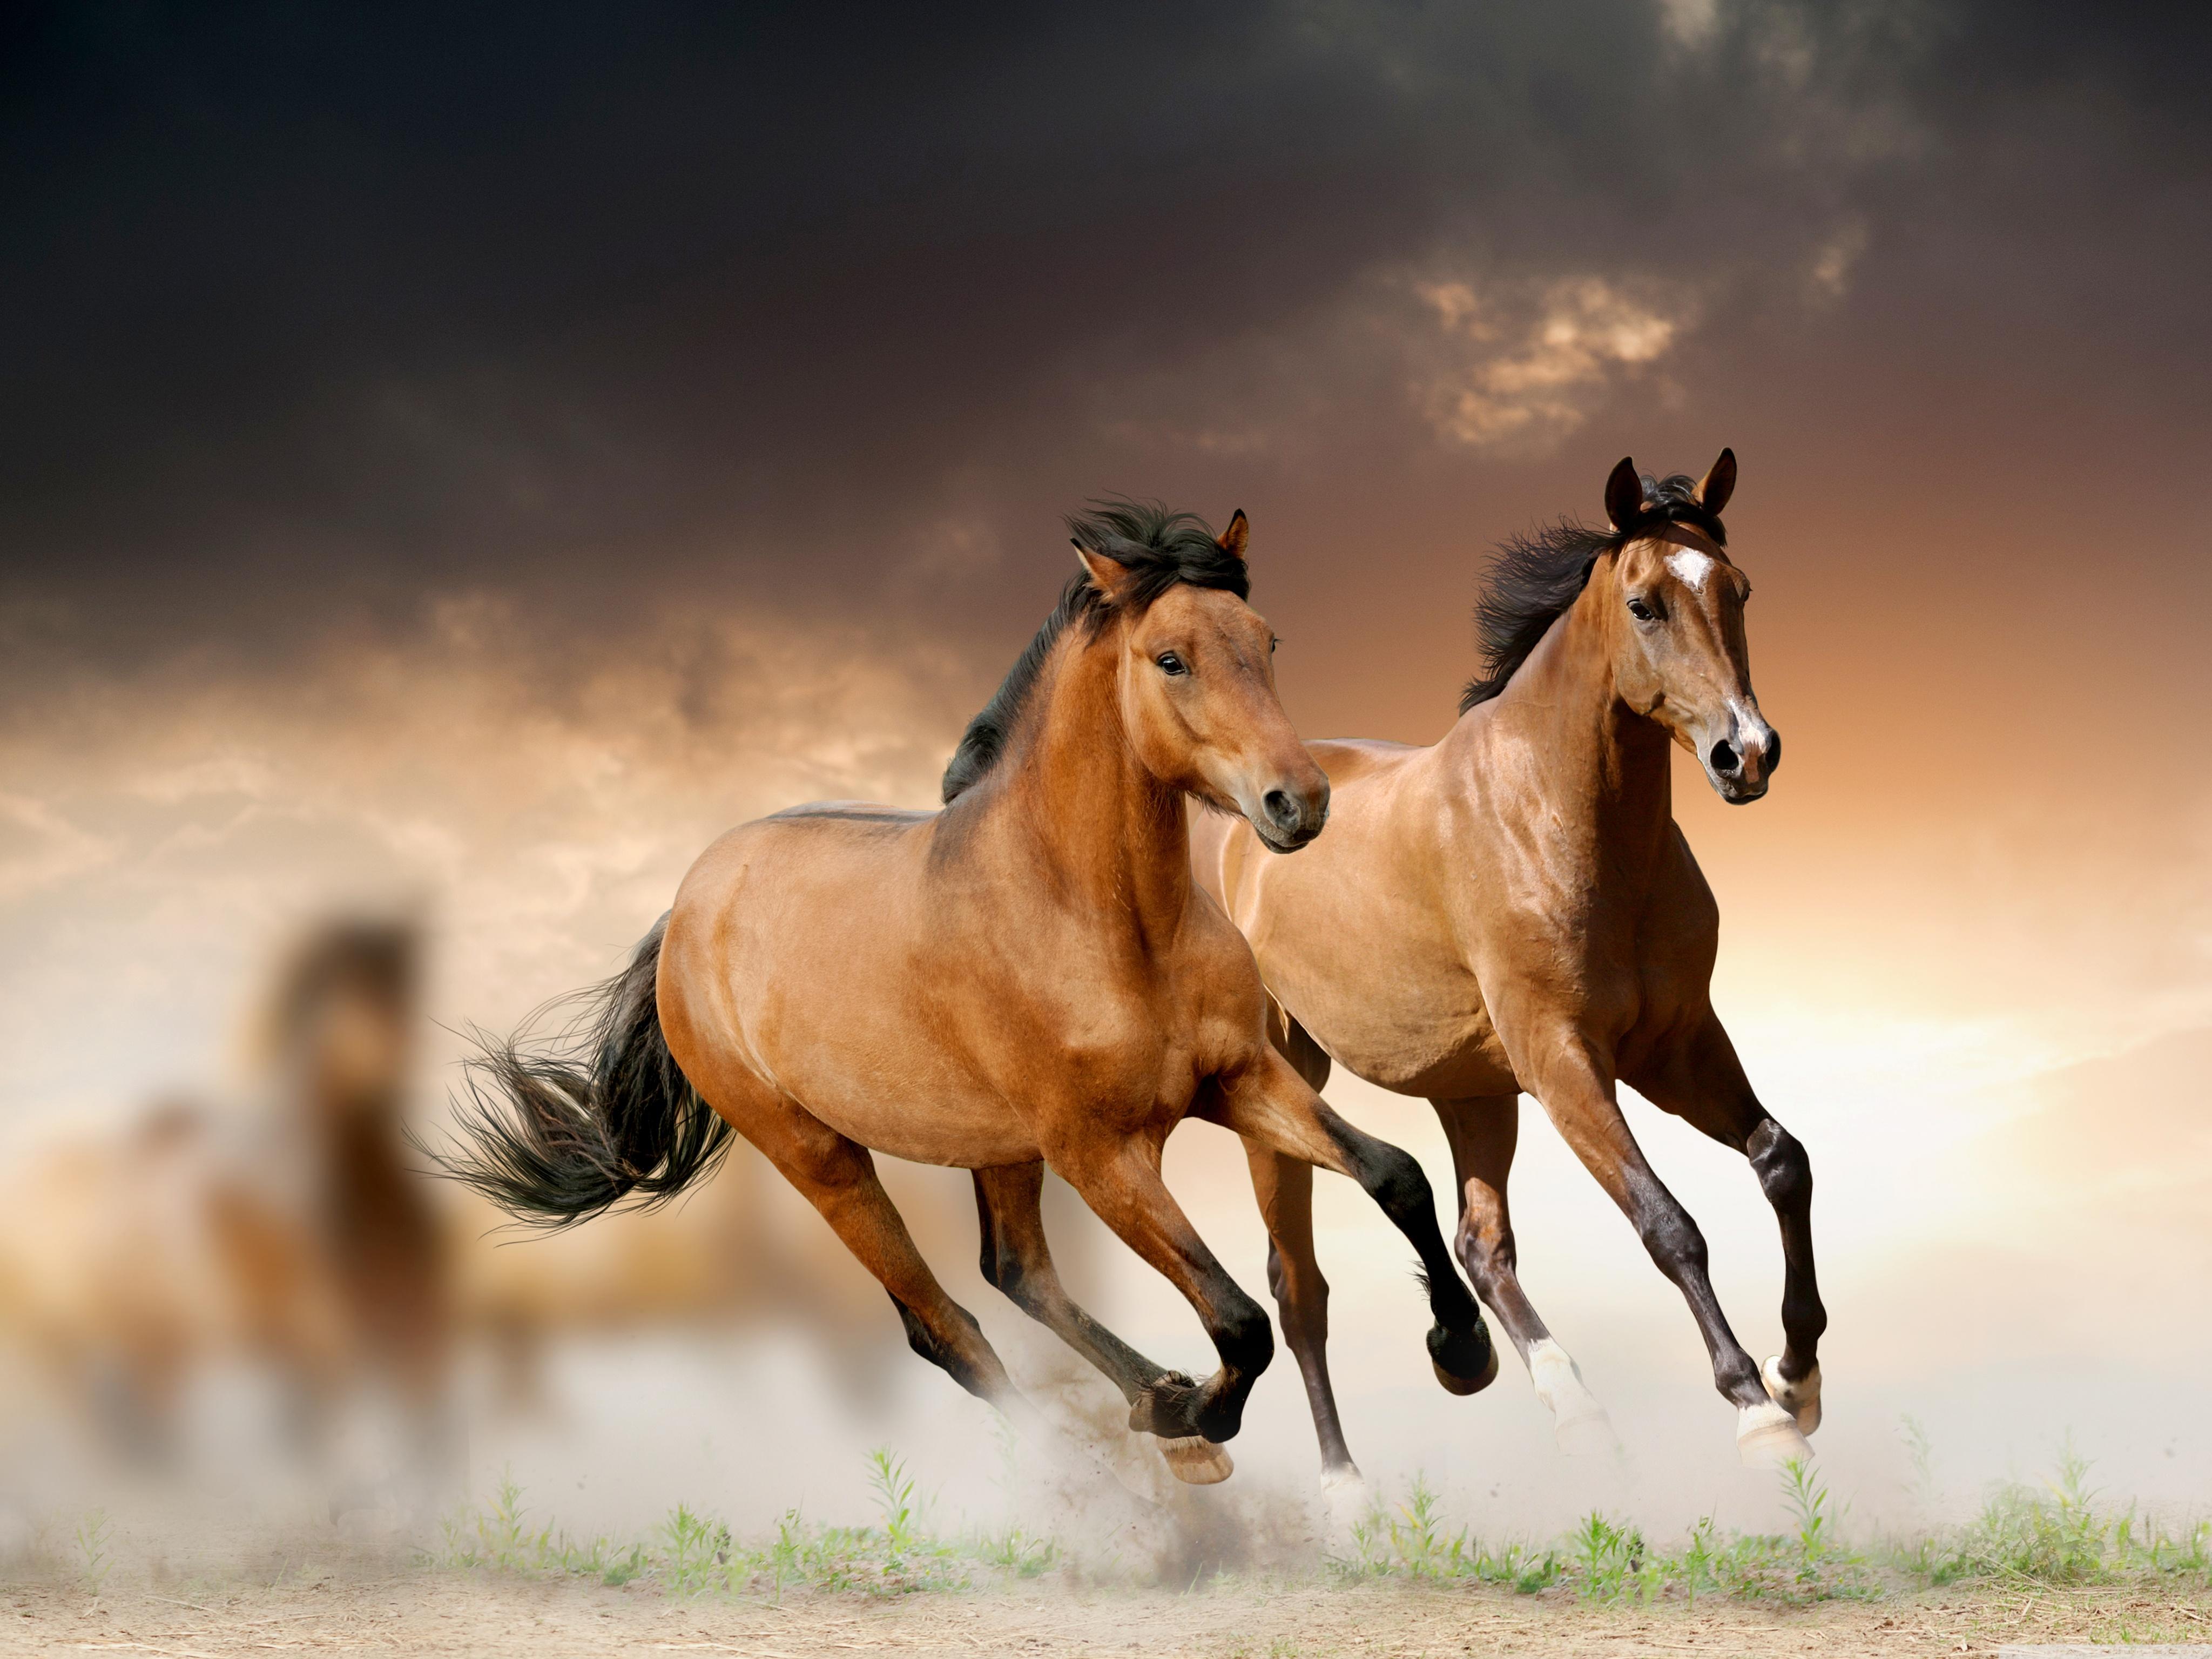 Horse Horse Horse Horse Horse Horse Horse Horse